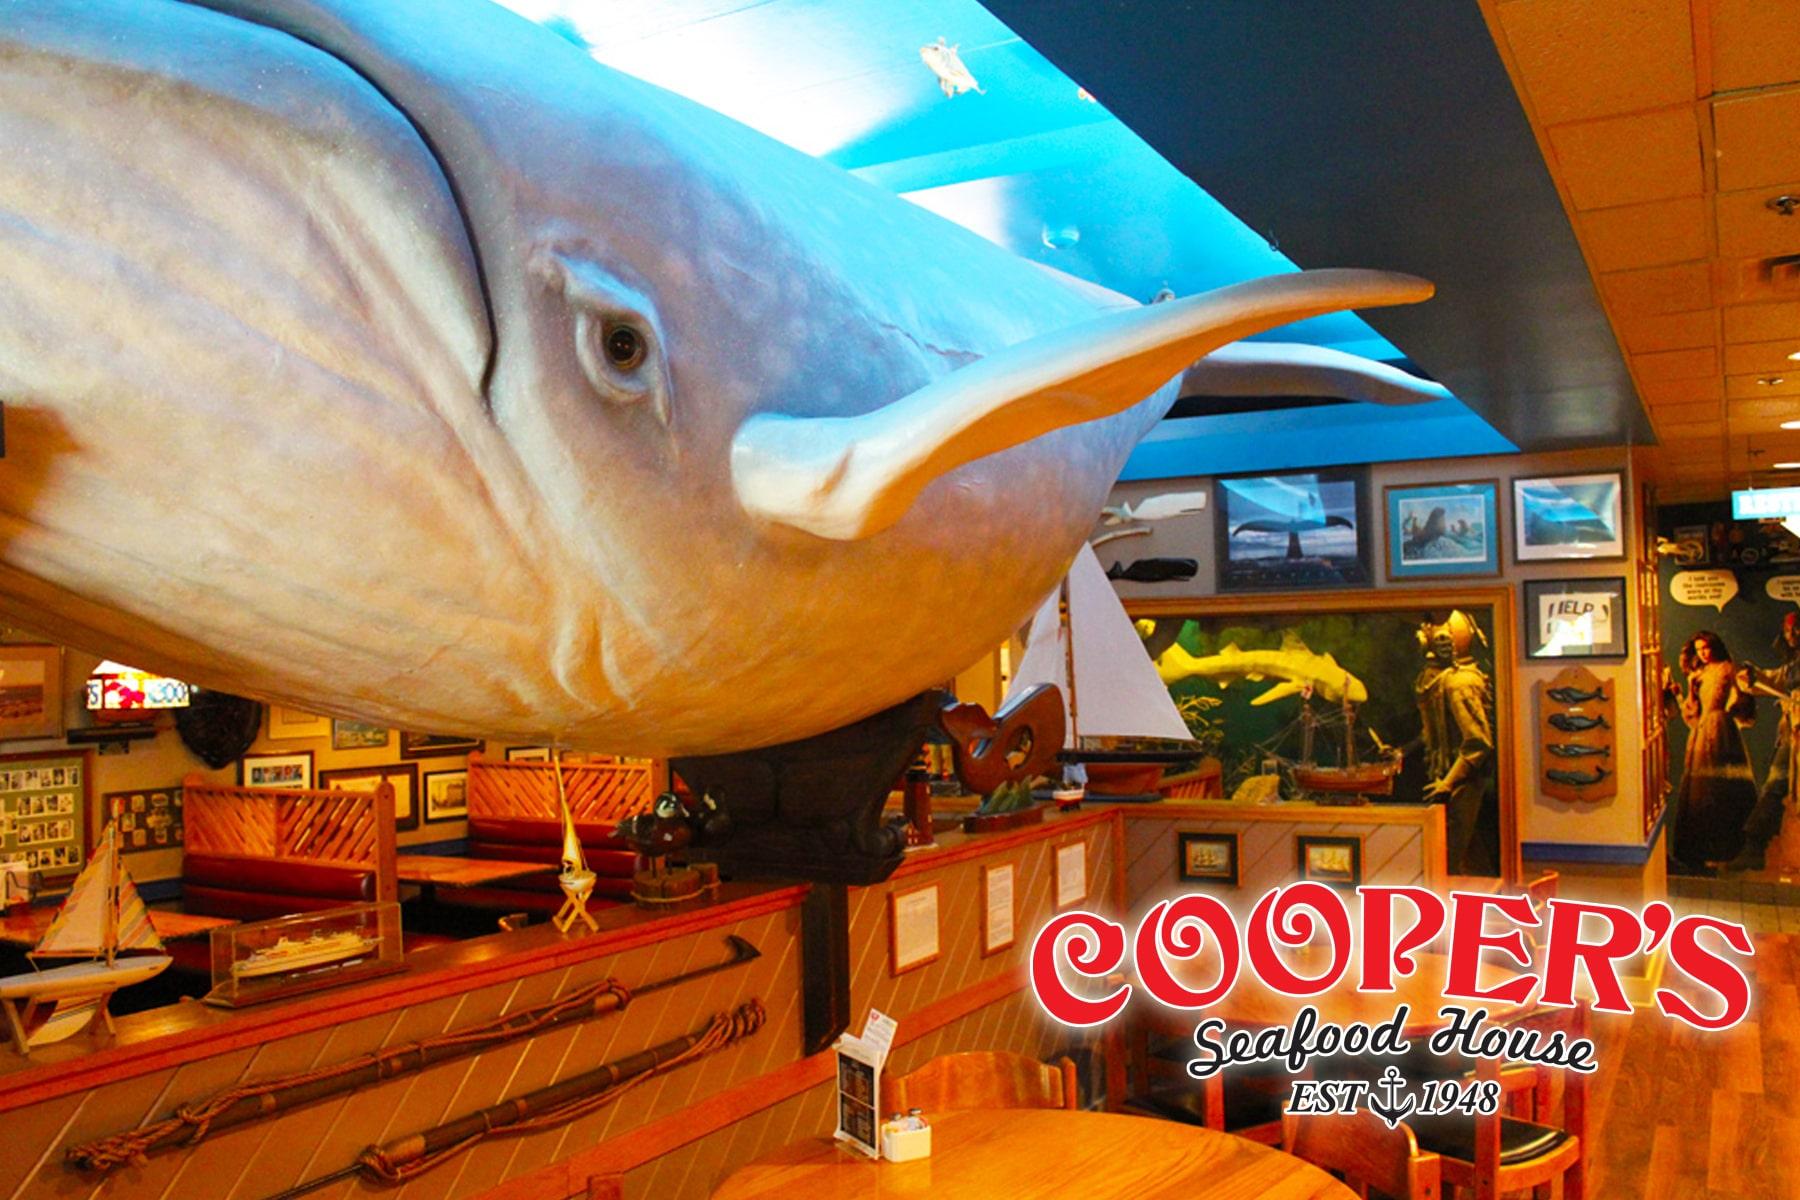 Cooper's Seafood House Job Listings